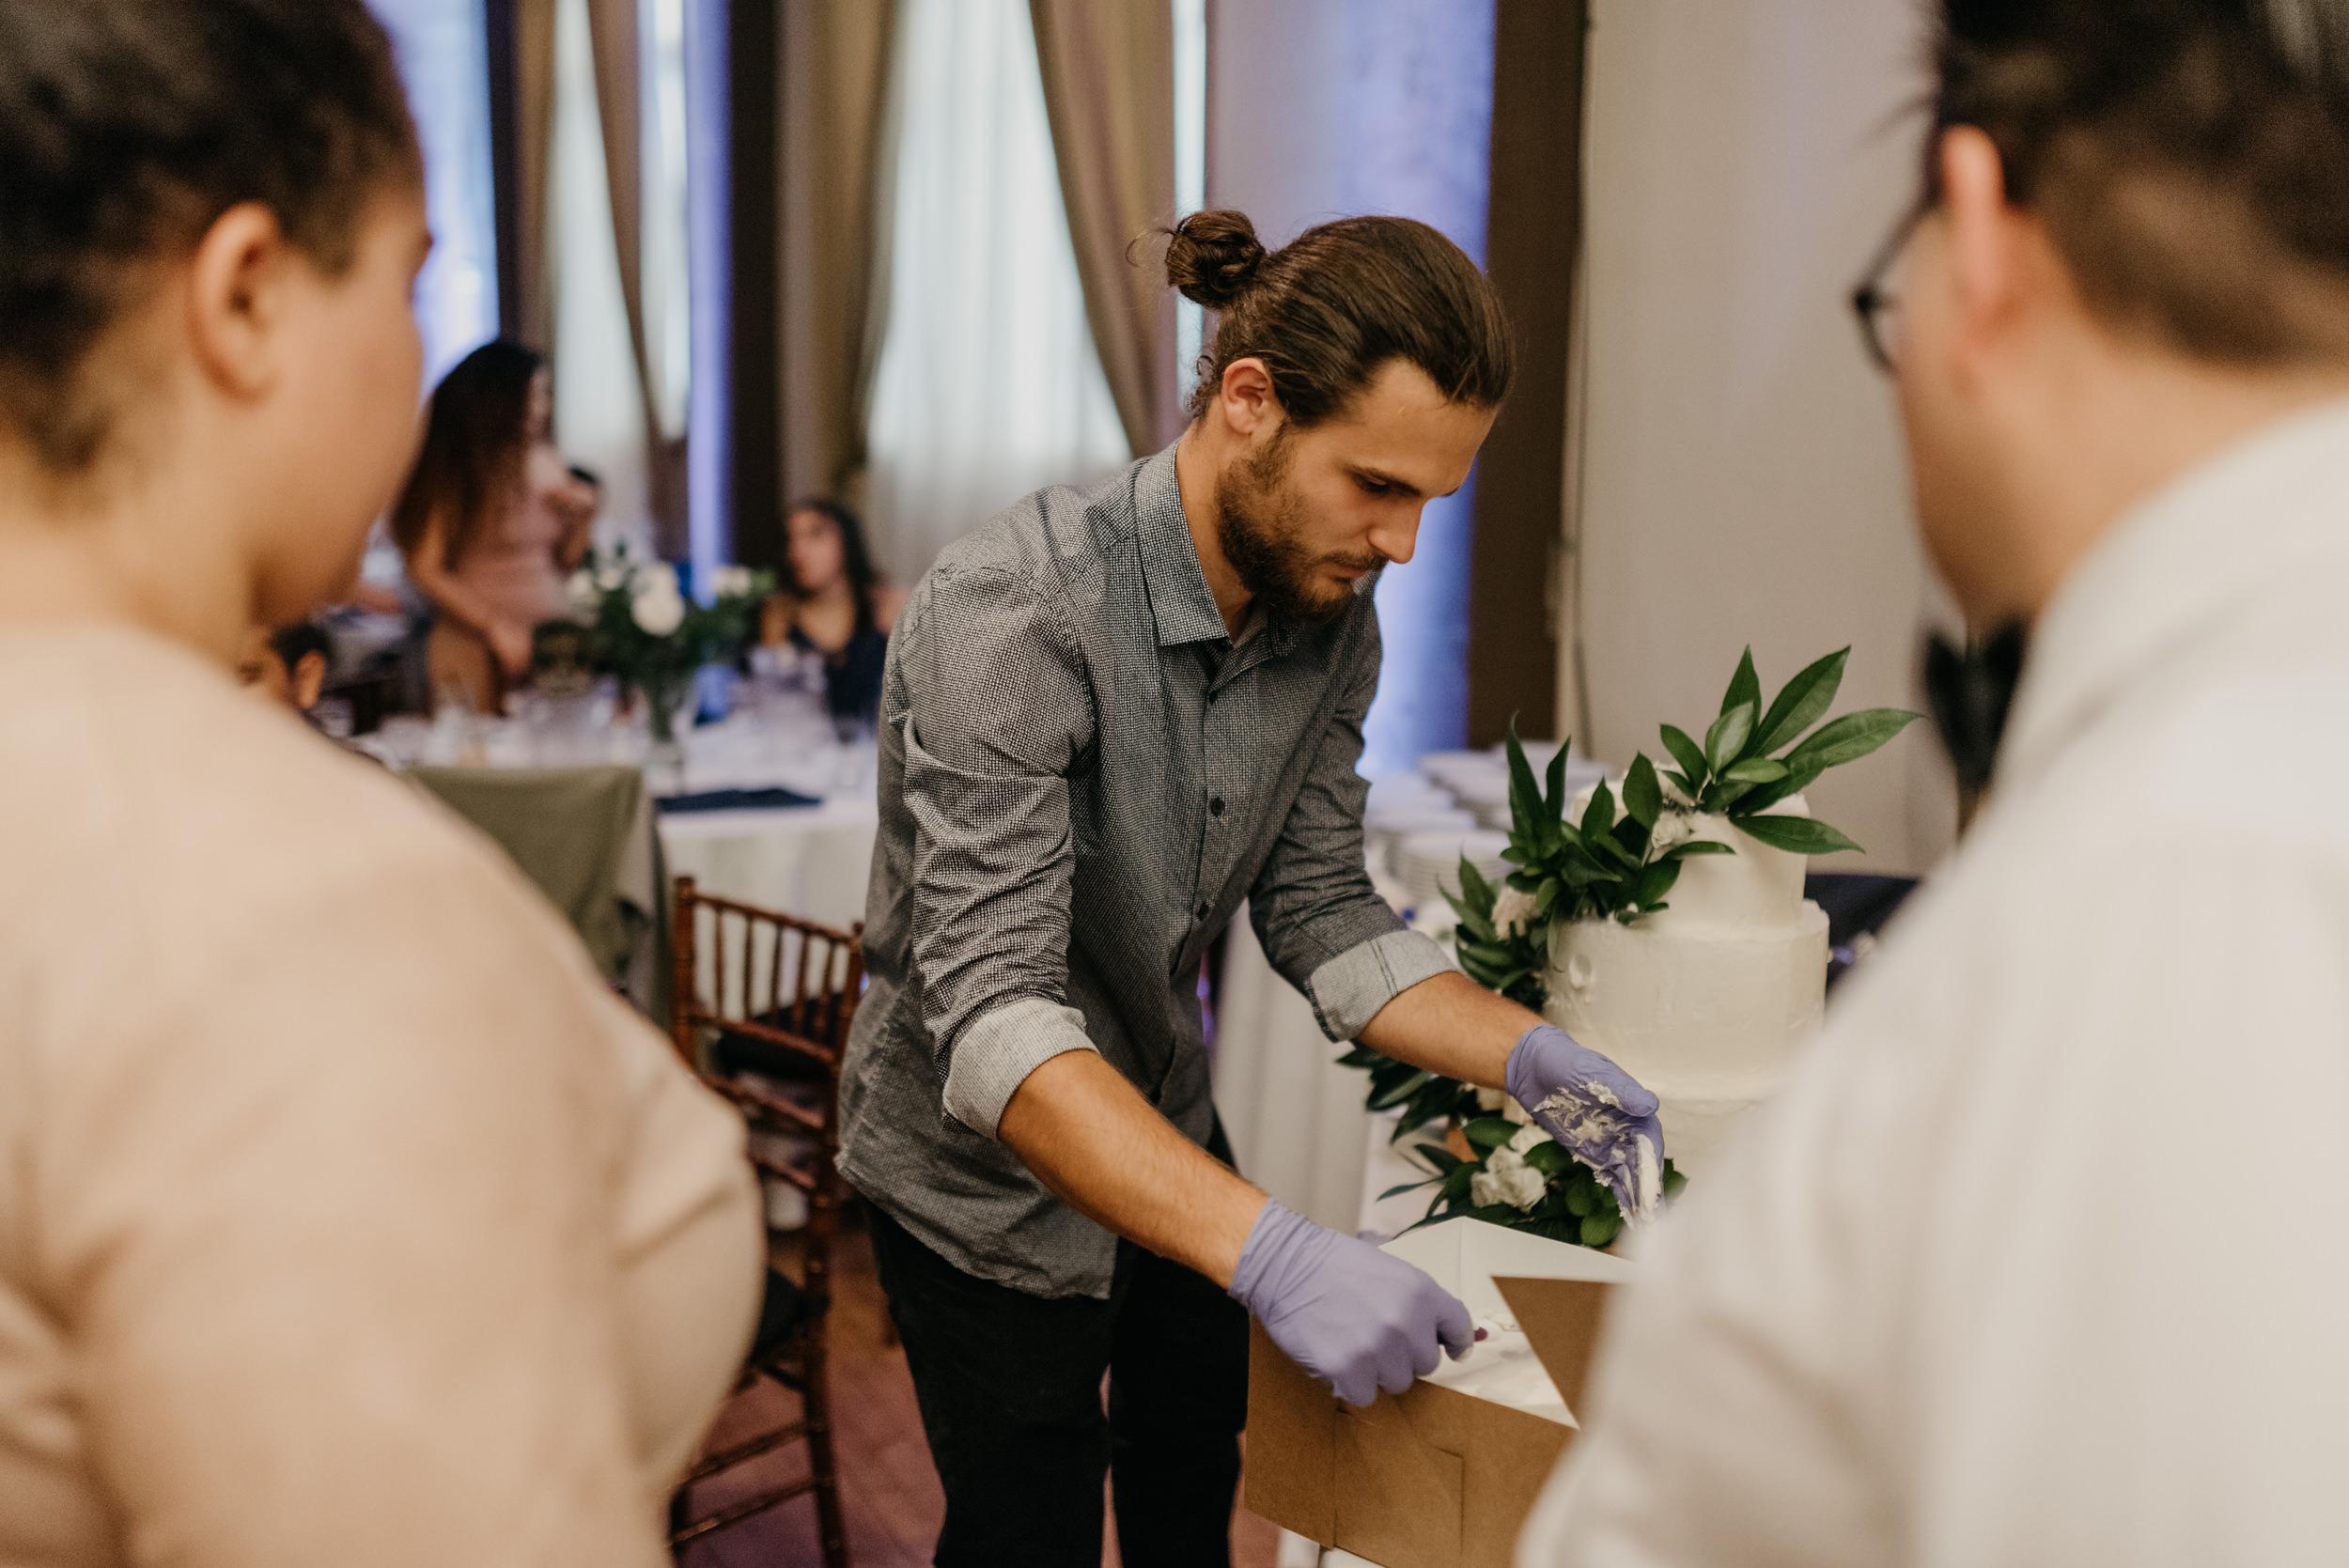 114-reception-west-end-ballroom-portland-wedding-photographer-8593.jpg